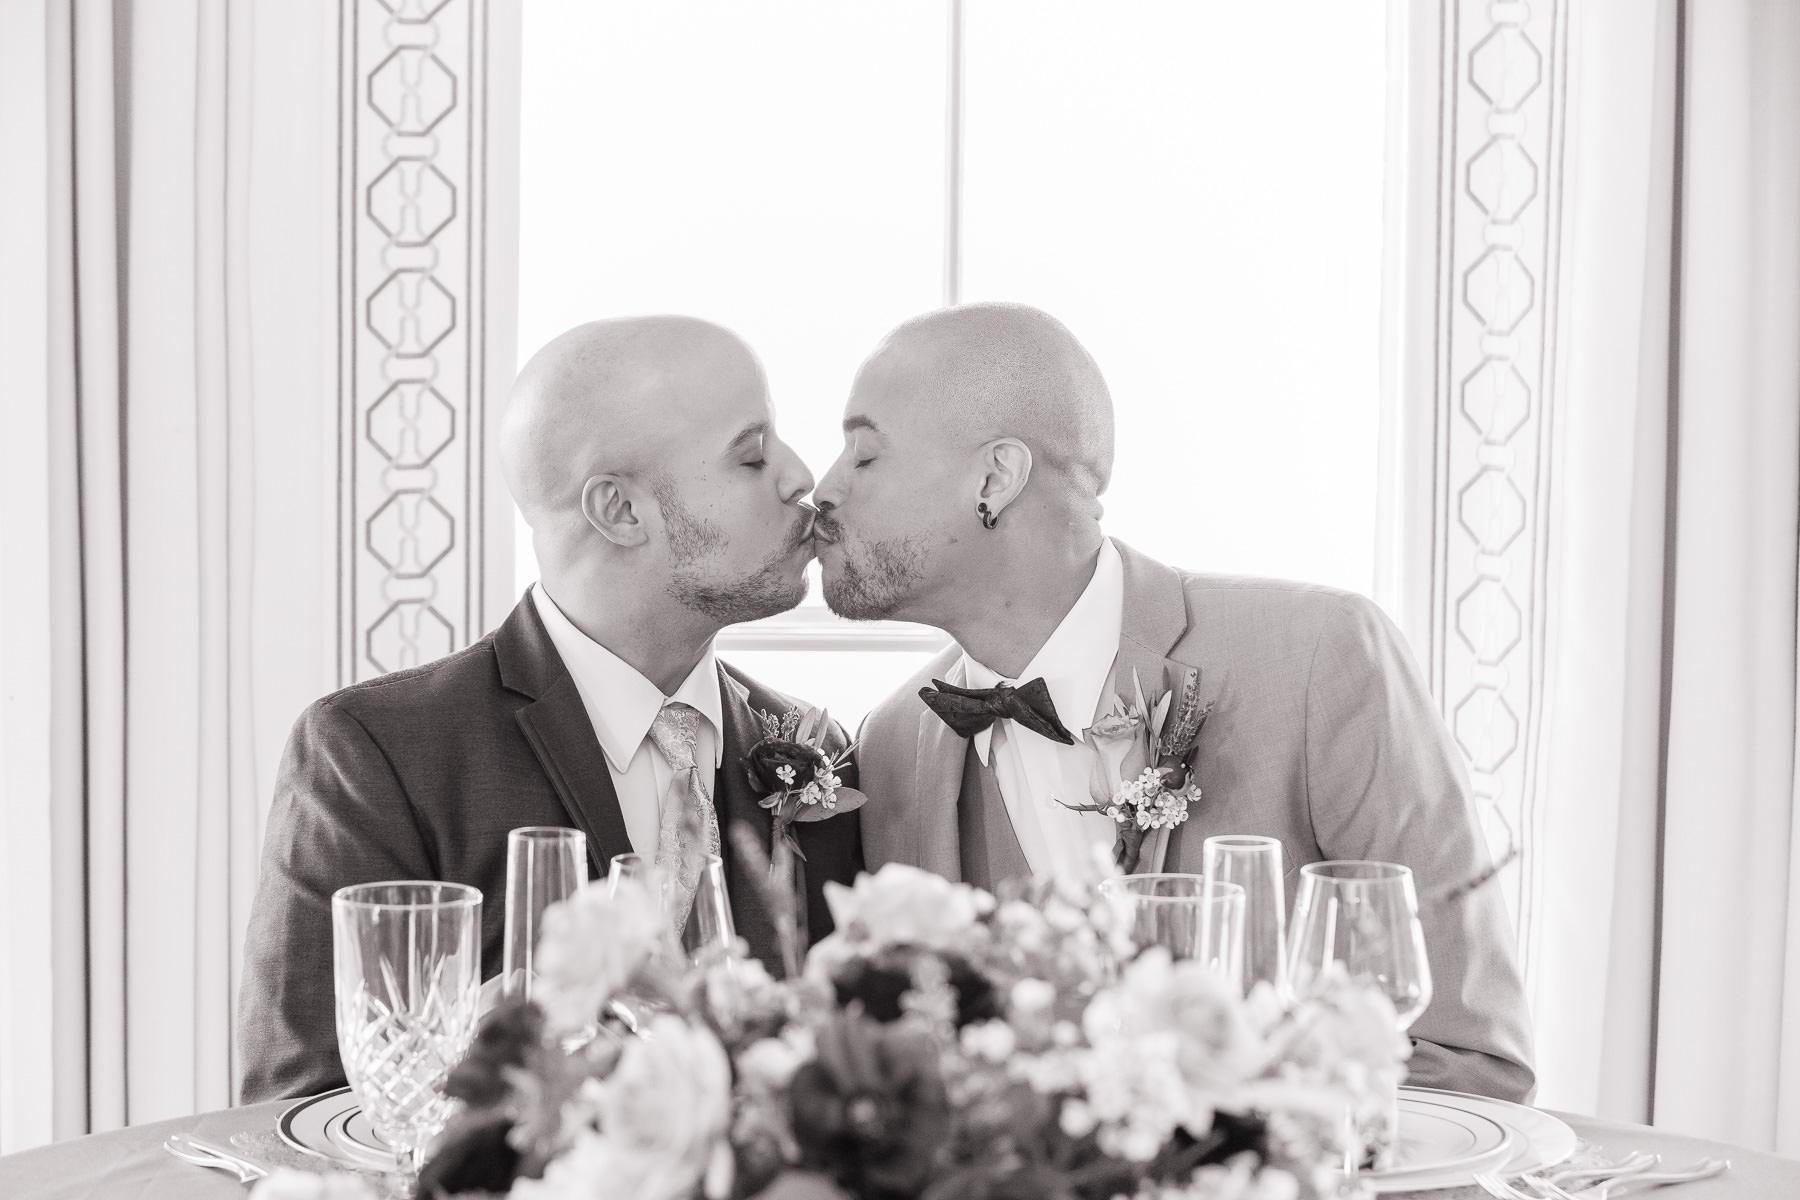 Eisenhower House, Newport, Rhode Island, Tracy Jenkins Photography, wedding, LGBTQ+, LGBT, Gay, Inclusive, Photography, Wedding photography, grooms, kiss